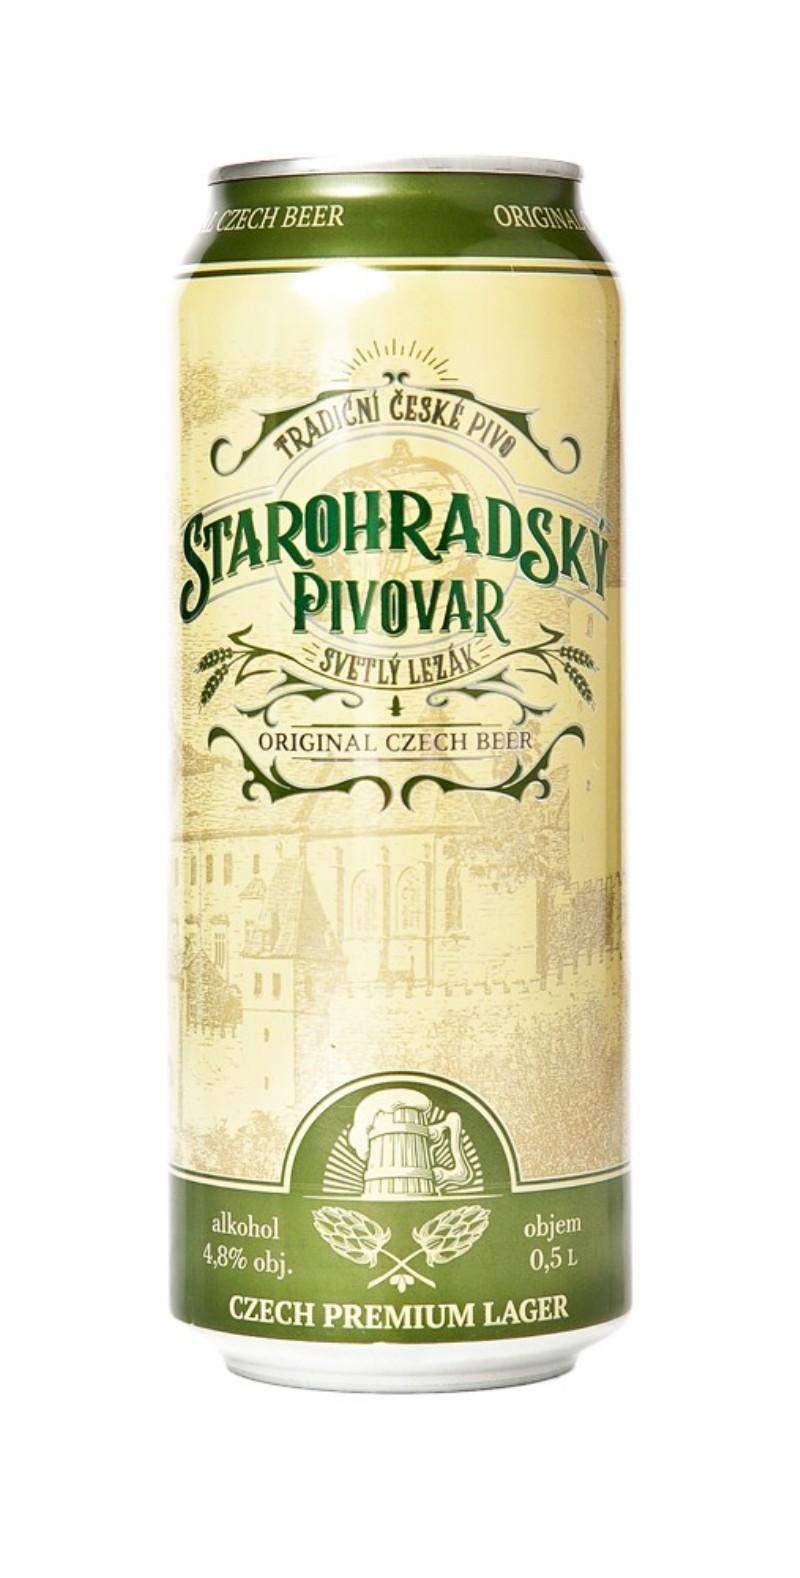 Starohradsky Pivovar           страна производитель Чехия Светлый лагер 4,8%  алк, 0,5л12х0,5 Старая чешская рецептура.